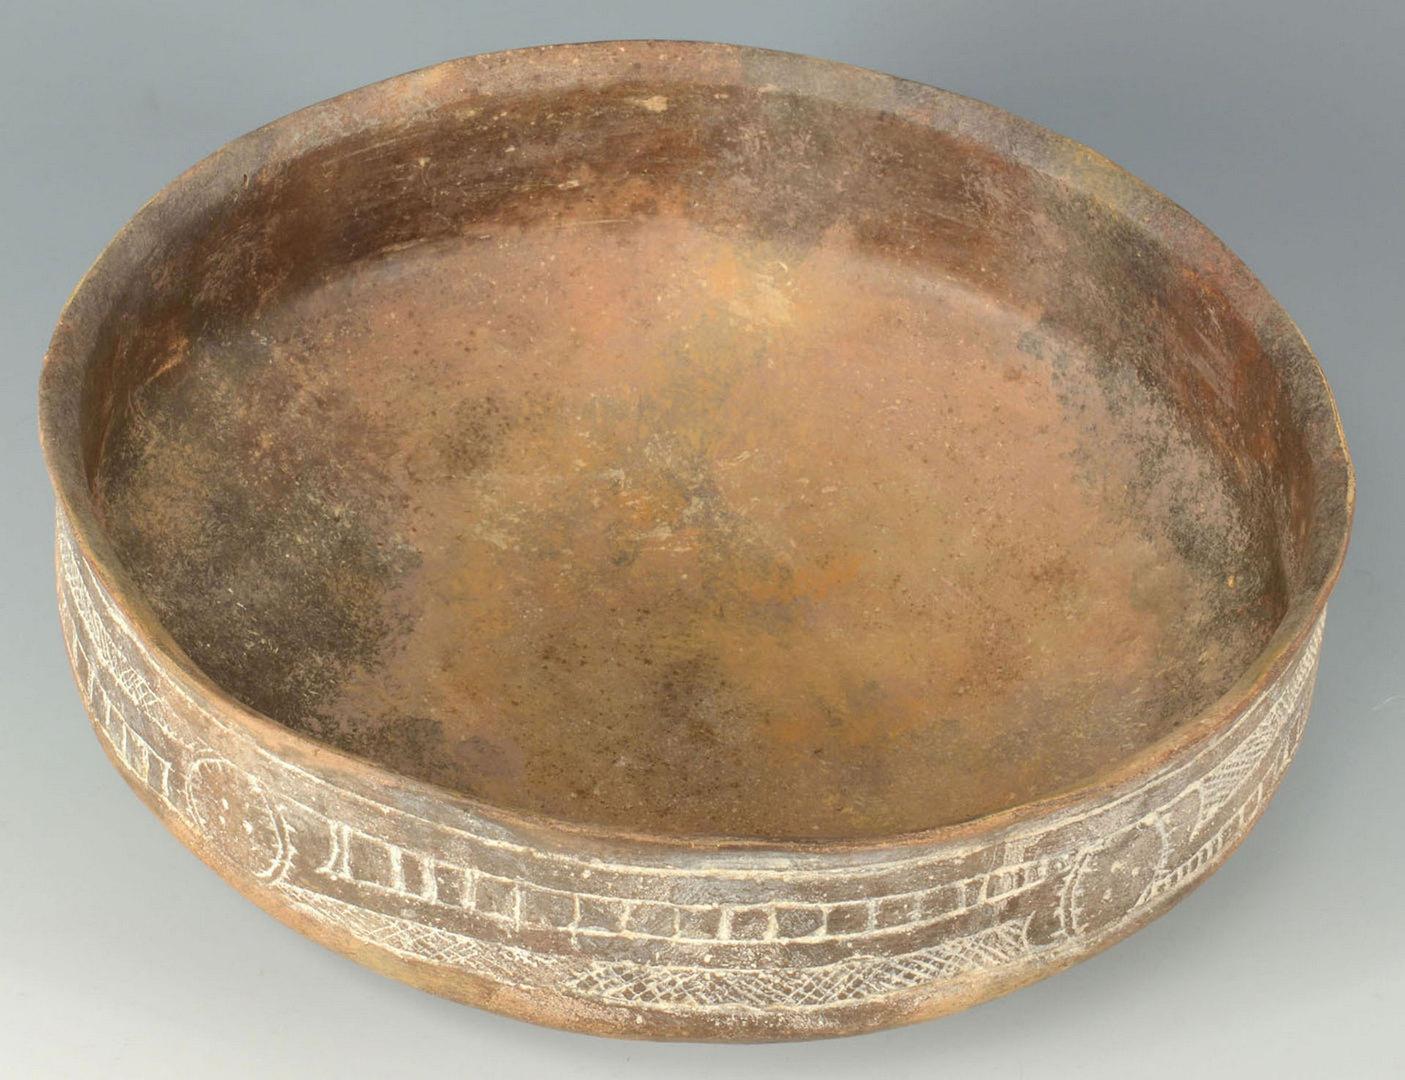 Lot 398: Caddo Bowl w/ Friendship Engraved Rim